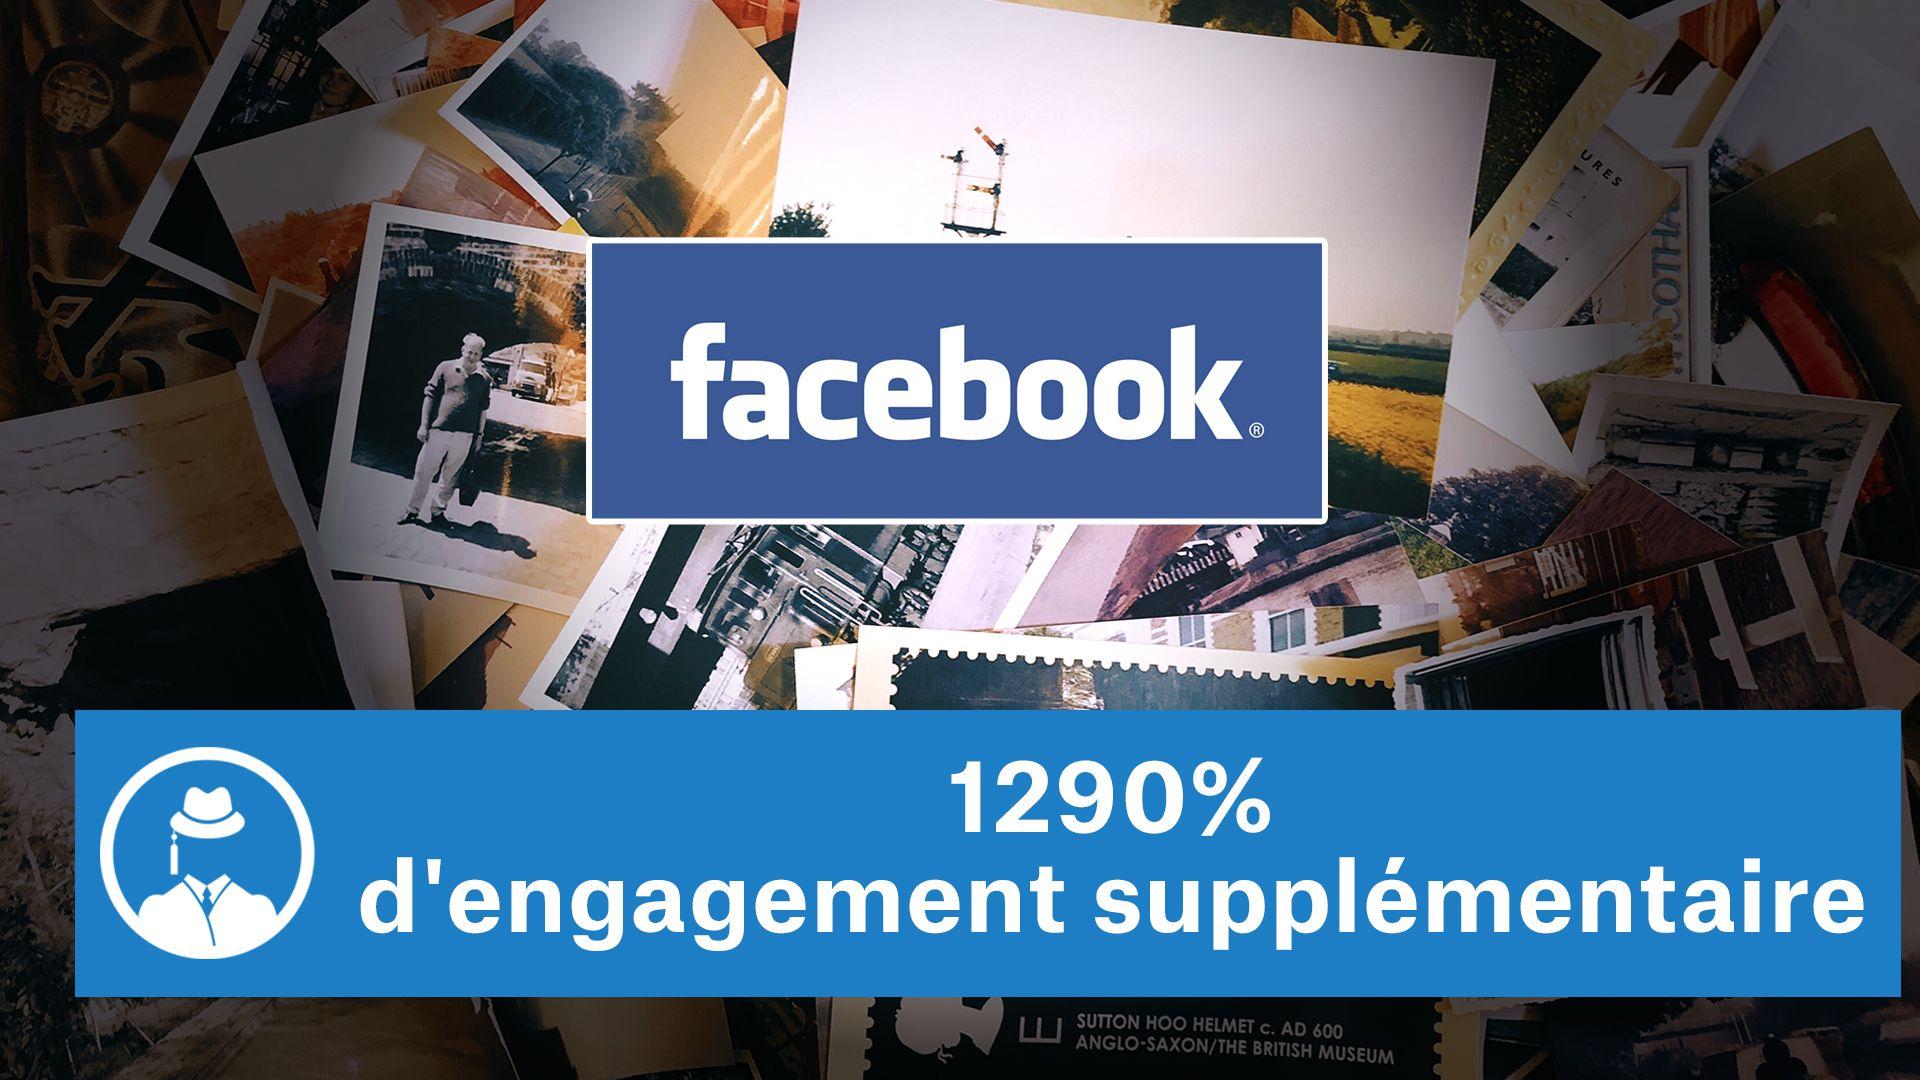 1290% d'engagement supplémentaire sur Facebook #GrowthHacking #WebMarketing #FormationGrowthHacking #CentreDeFormationFrance #TunnelAARRR #AARRR #SocialMedia #CommunityManagement #SEO #Facebook #FacebookTips